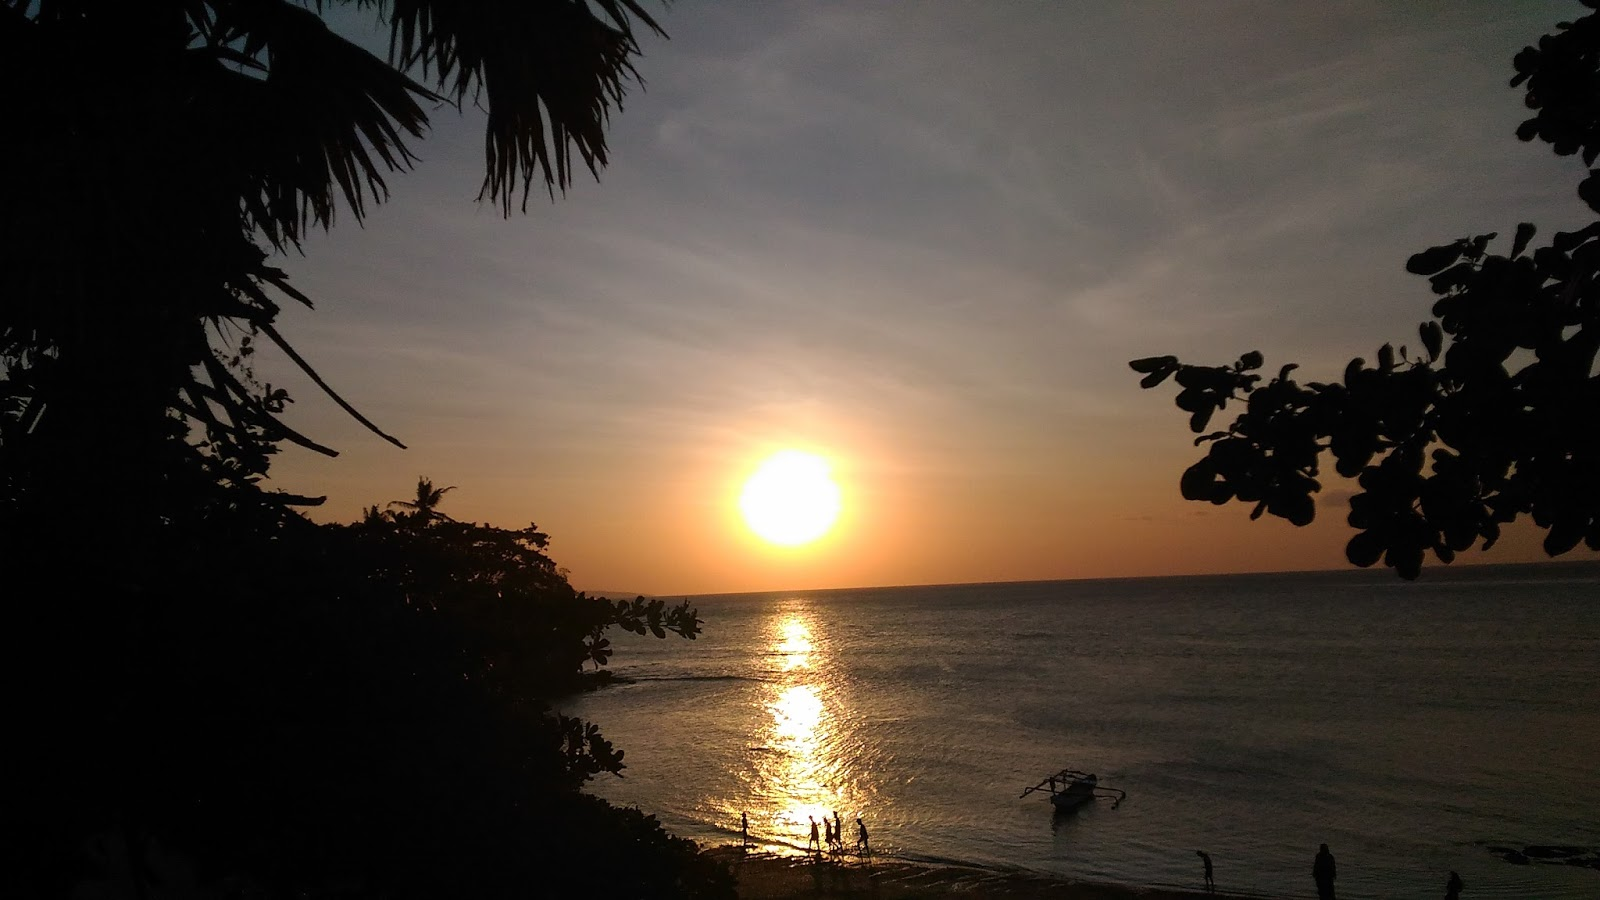 Arianto Ntt Sunset Pantai Ketapang Satu Kota Kupang Tedis Kab